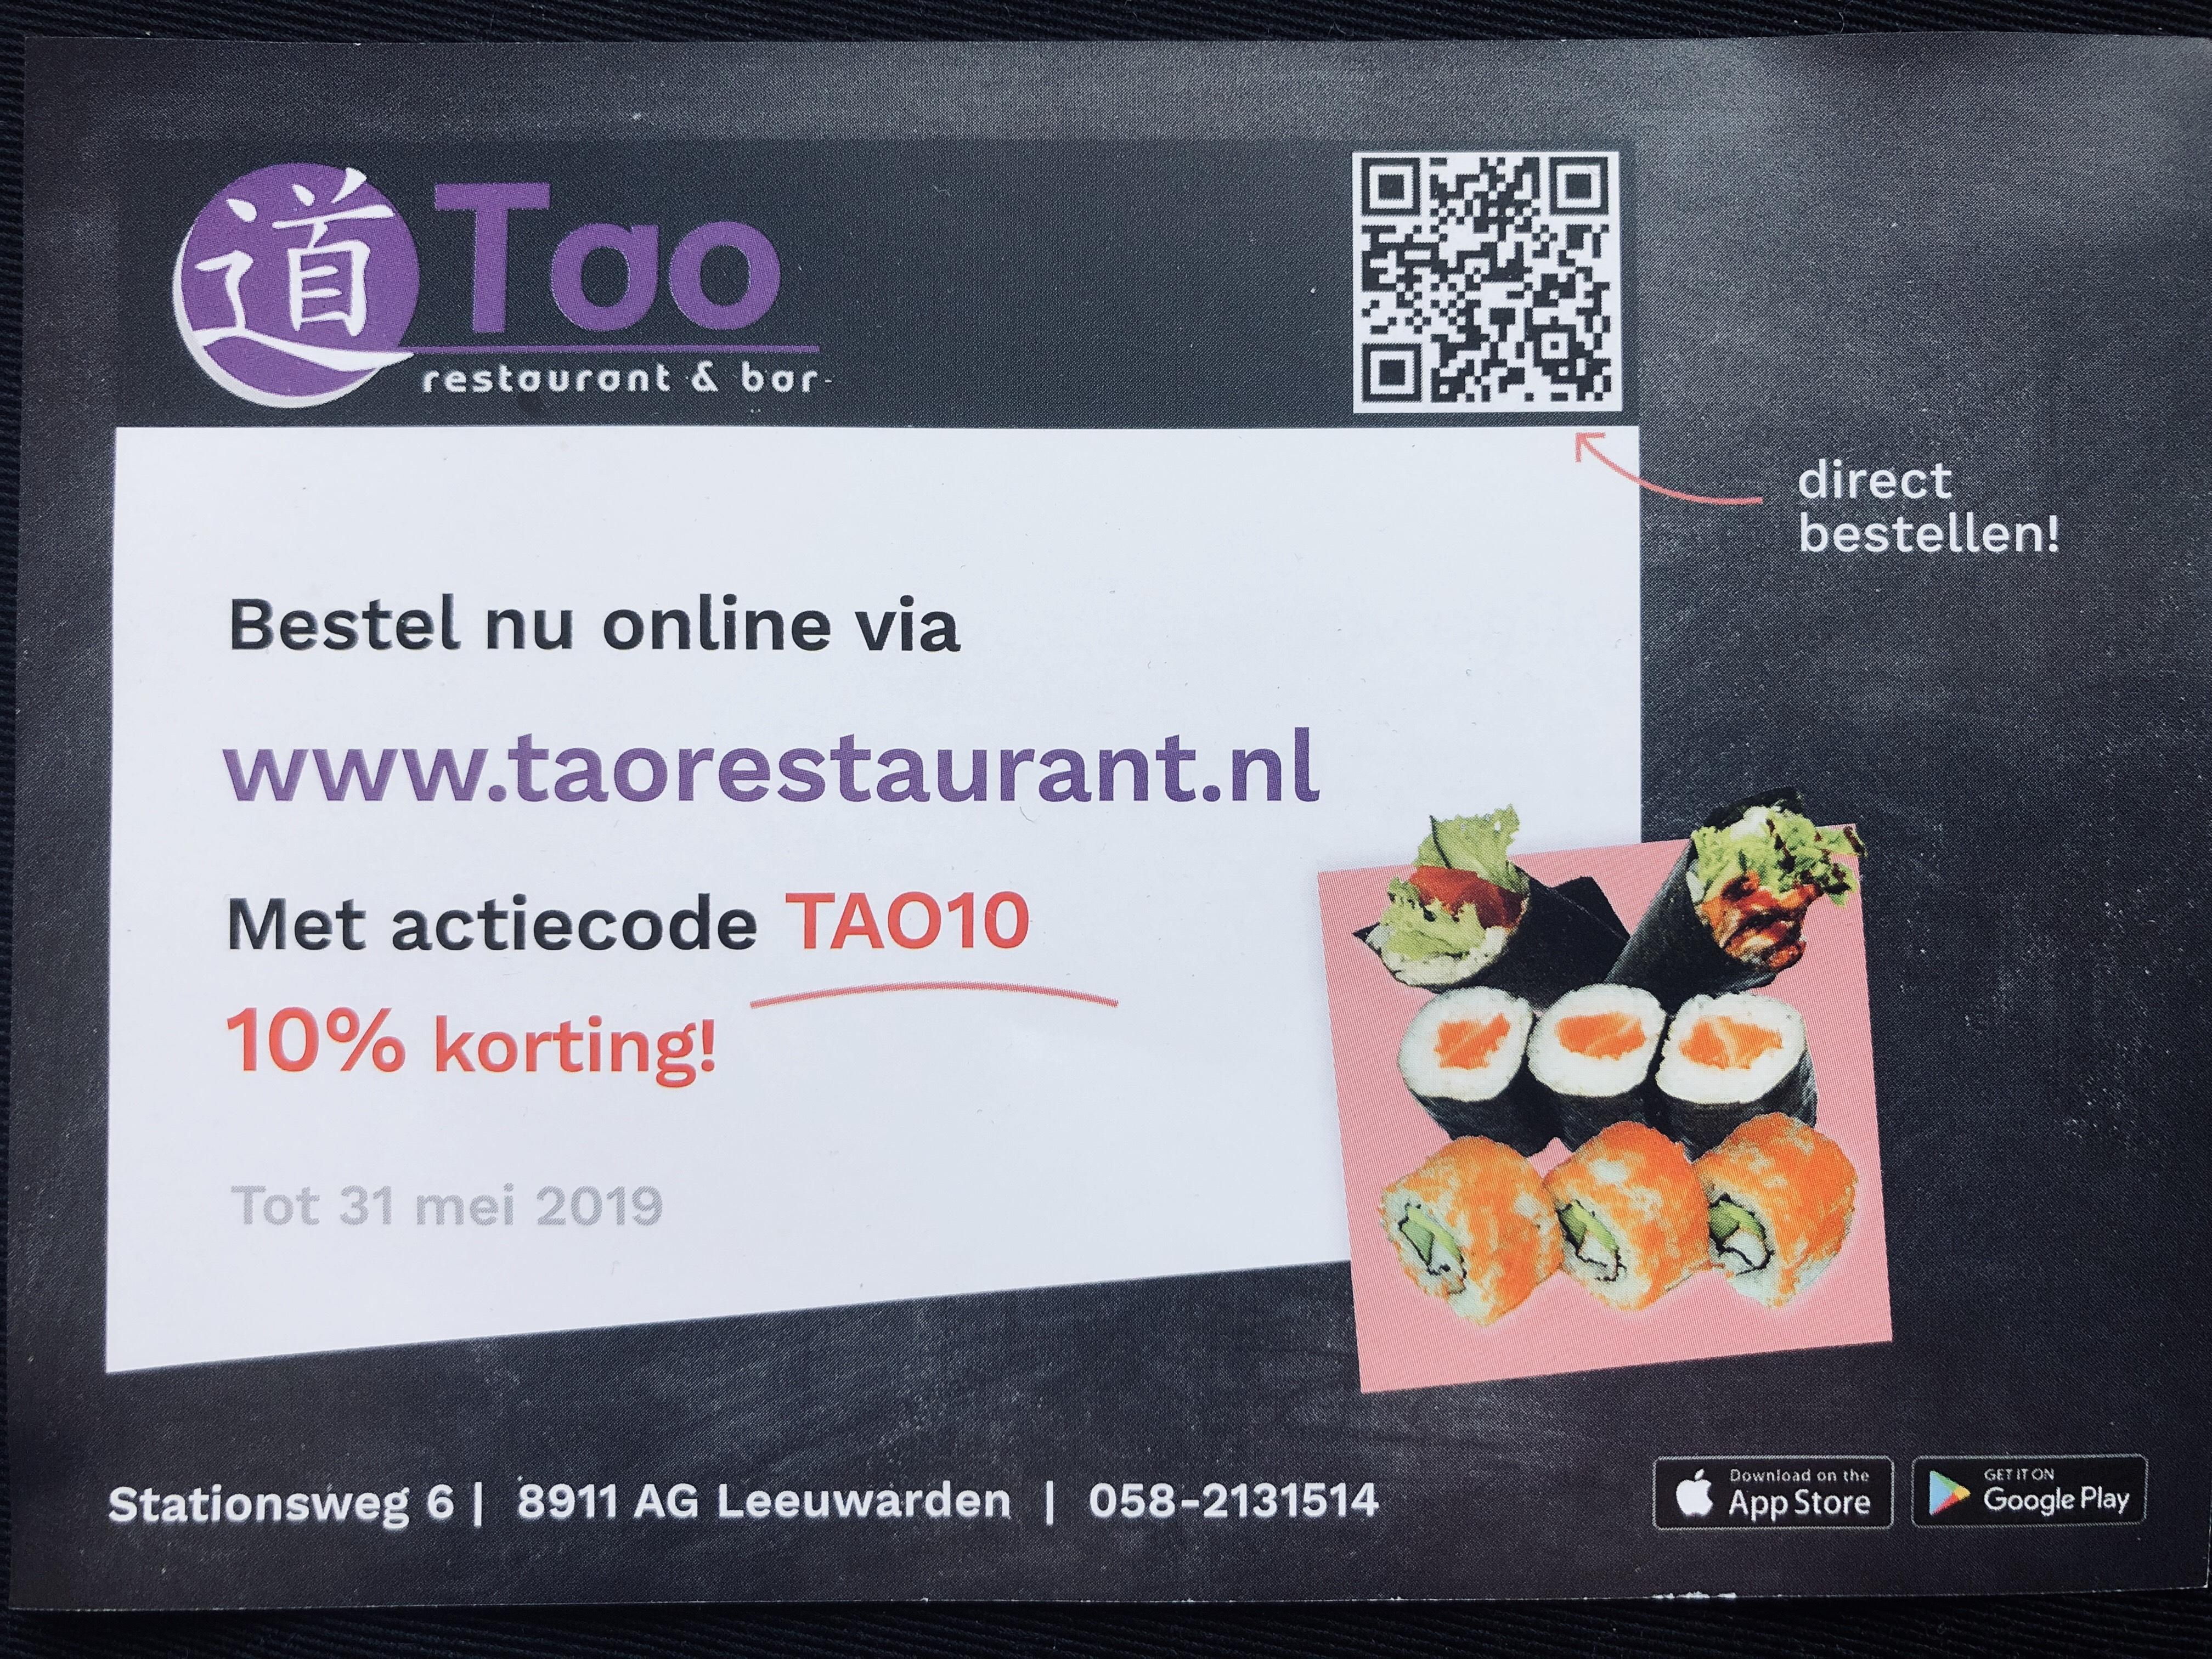 [Leeuwarden] 10% korting bij Tao Sushi restaurant